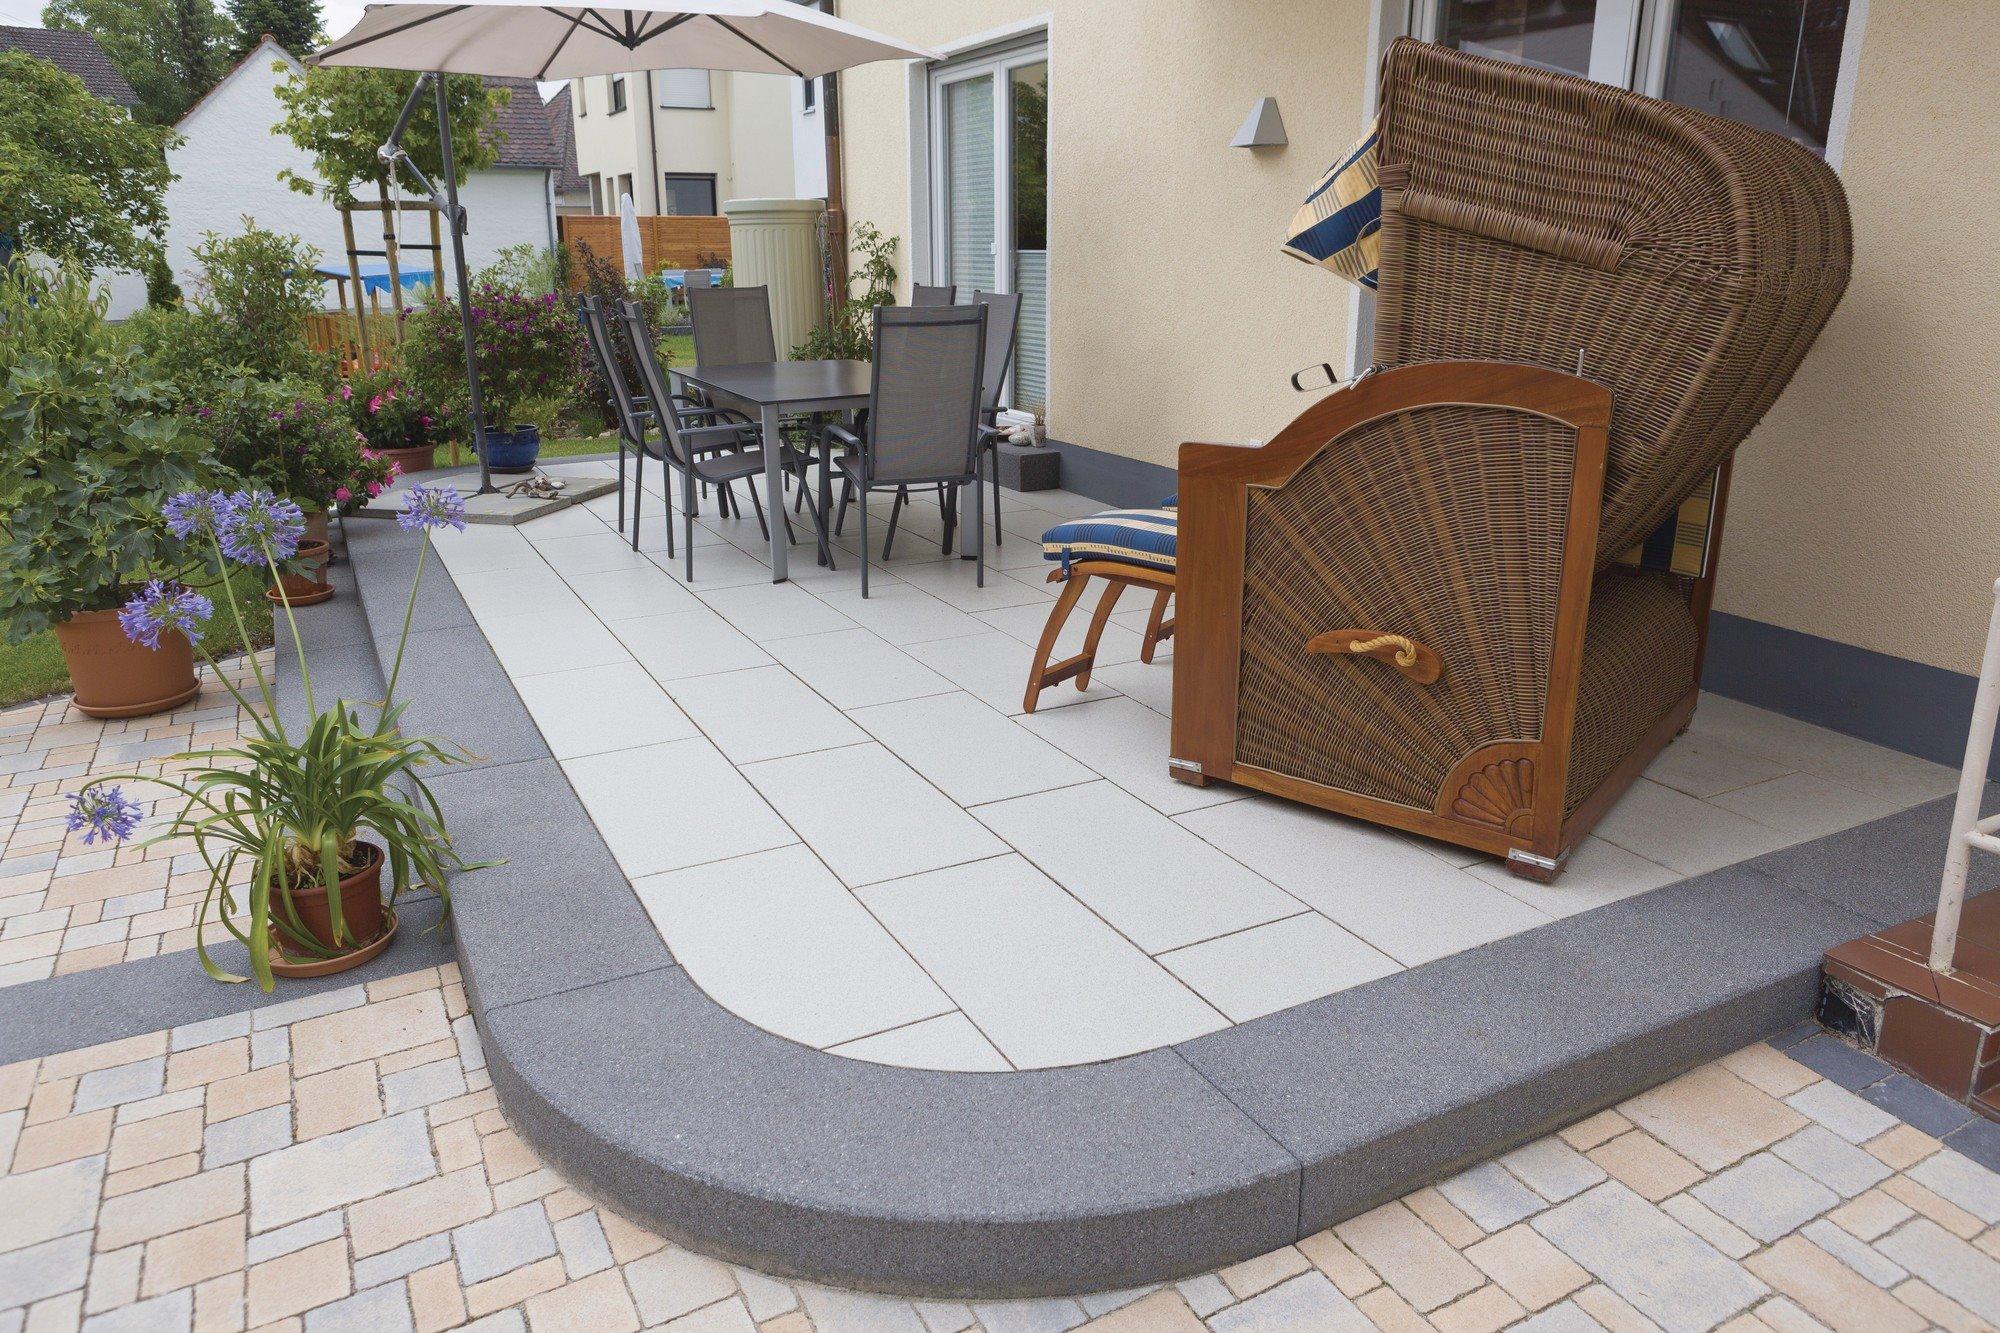 Rinn Terrassenplatten Reinigen Preshcool